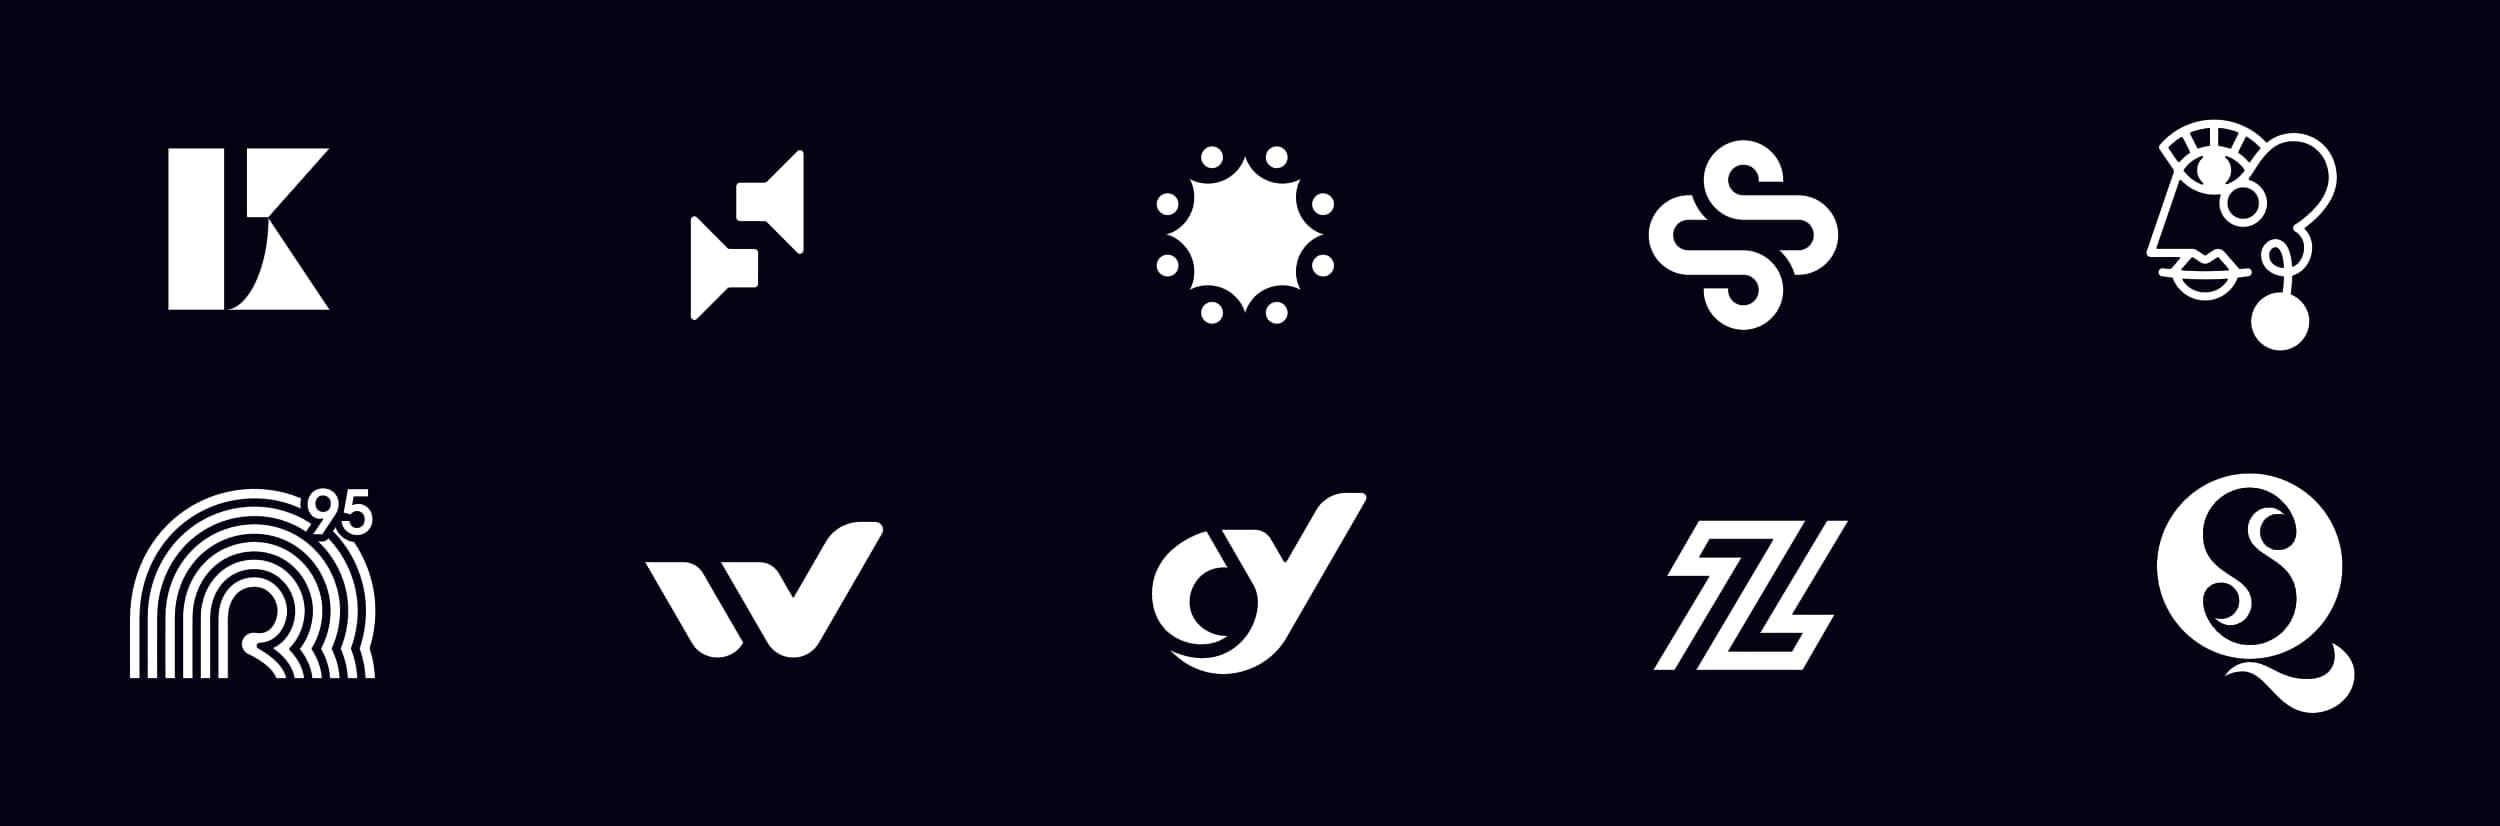 logofolio-header-02-min